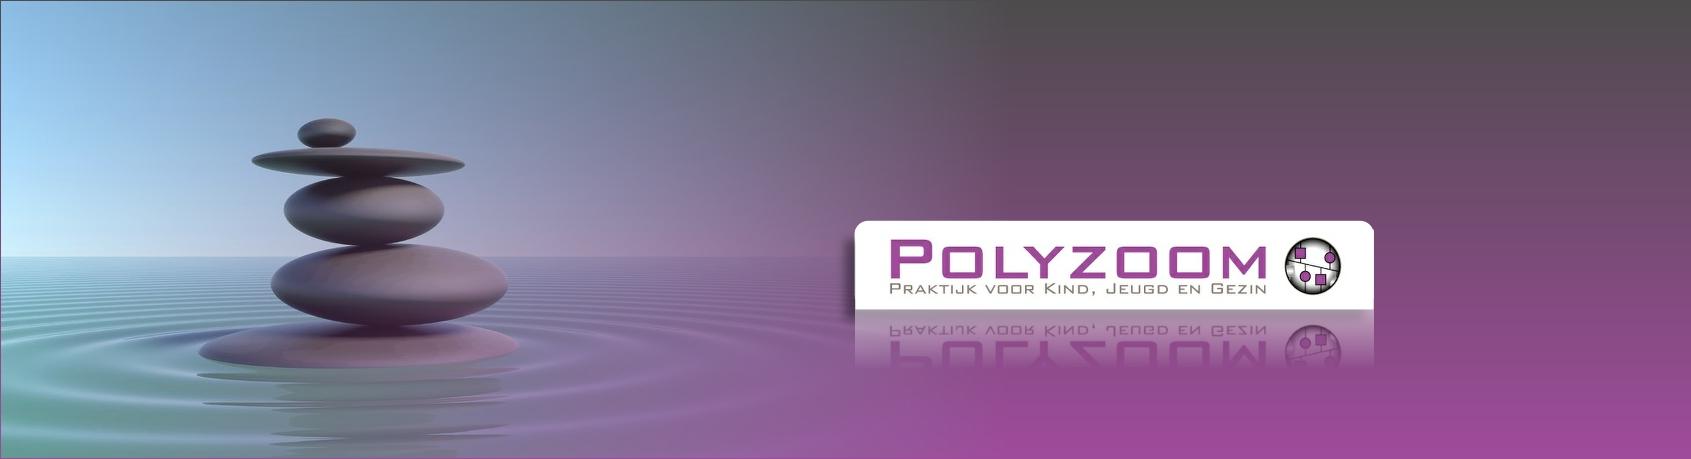 Polyzoom2-hulpverlening-kind-jeugd-gezin-paterswolde-eelde